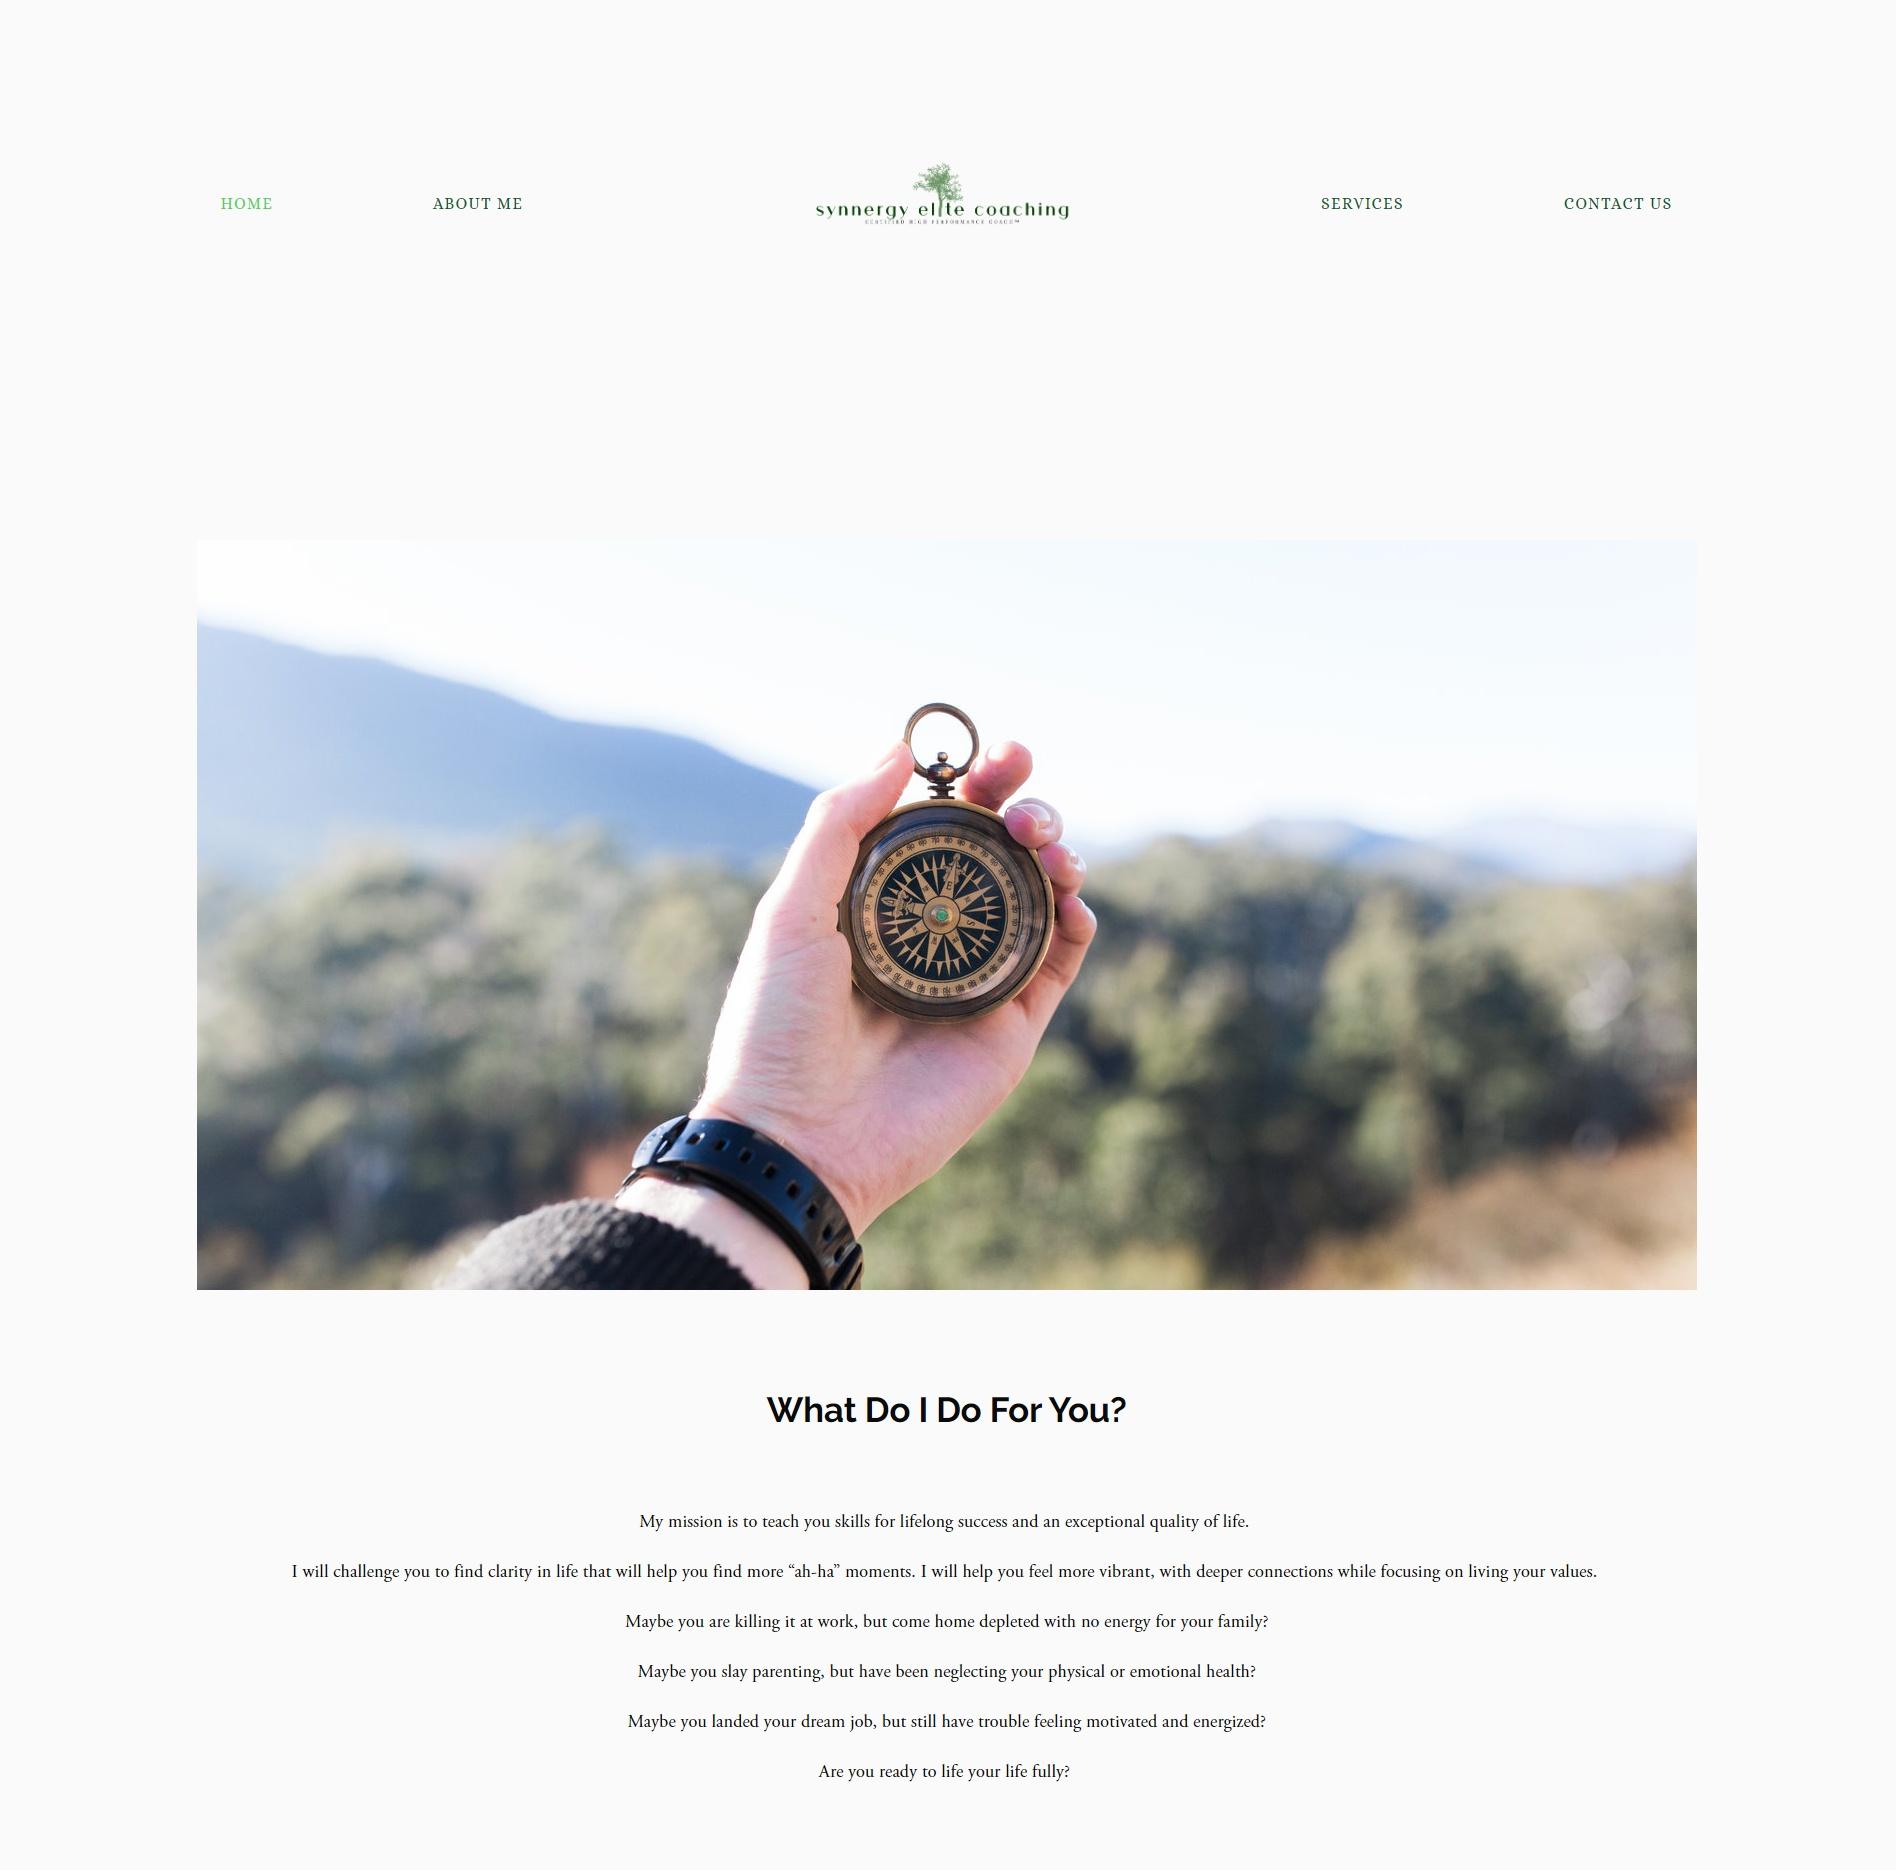 Synnergy Elite Coaching - Squarespace Custom Website